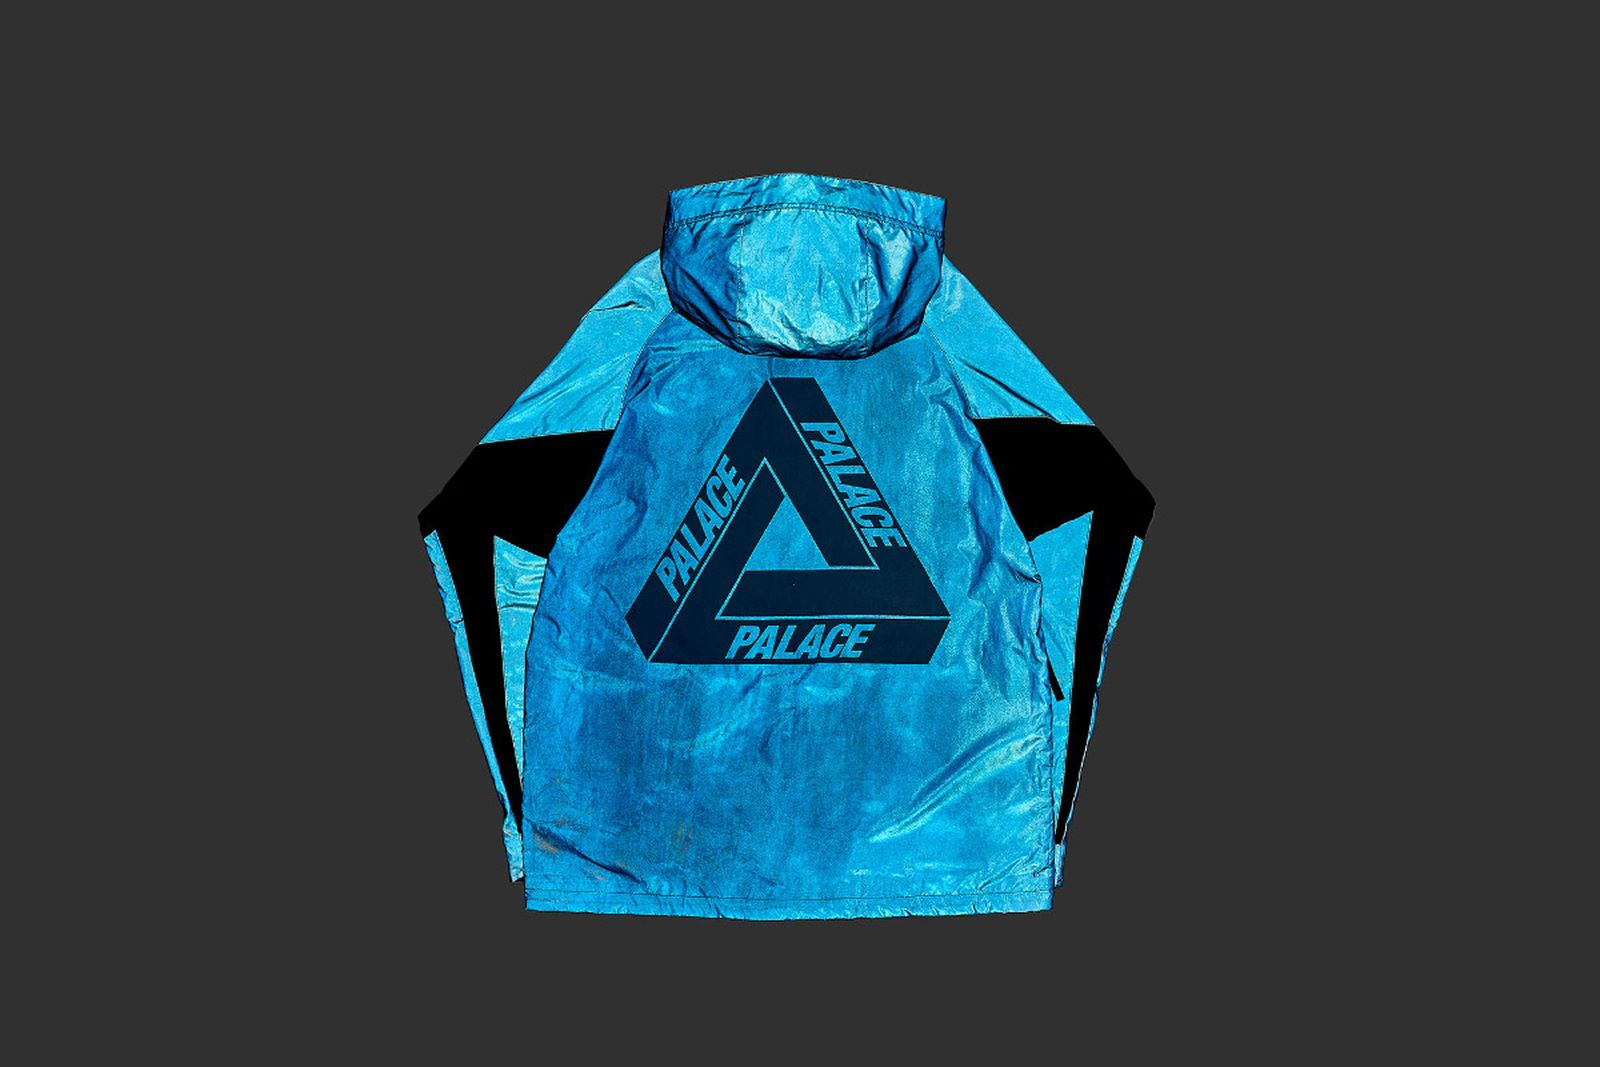 Palace 2019 Autumn Jacket Deflector blue reflective side fw19